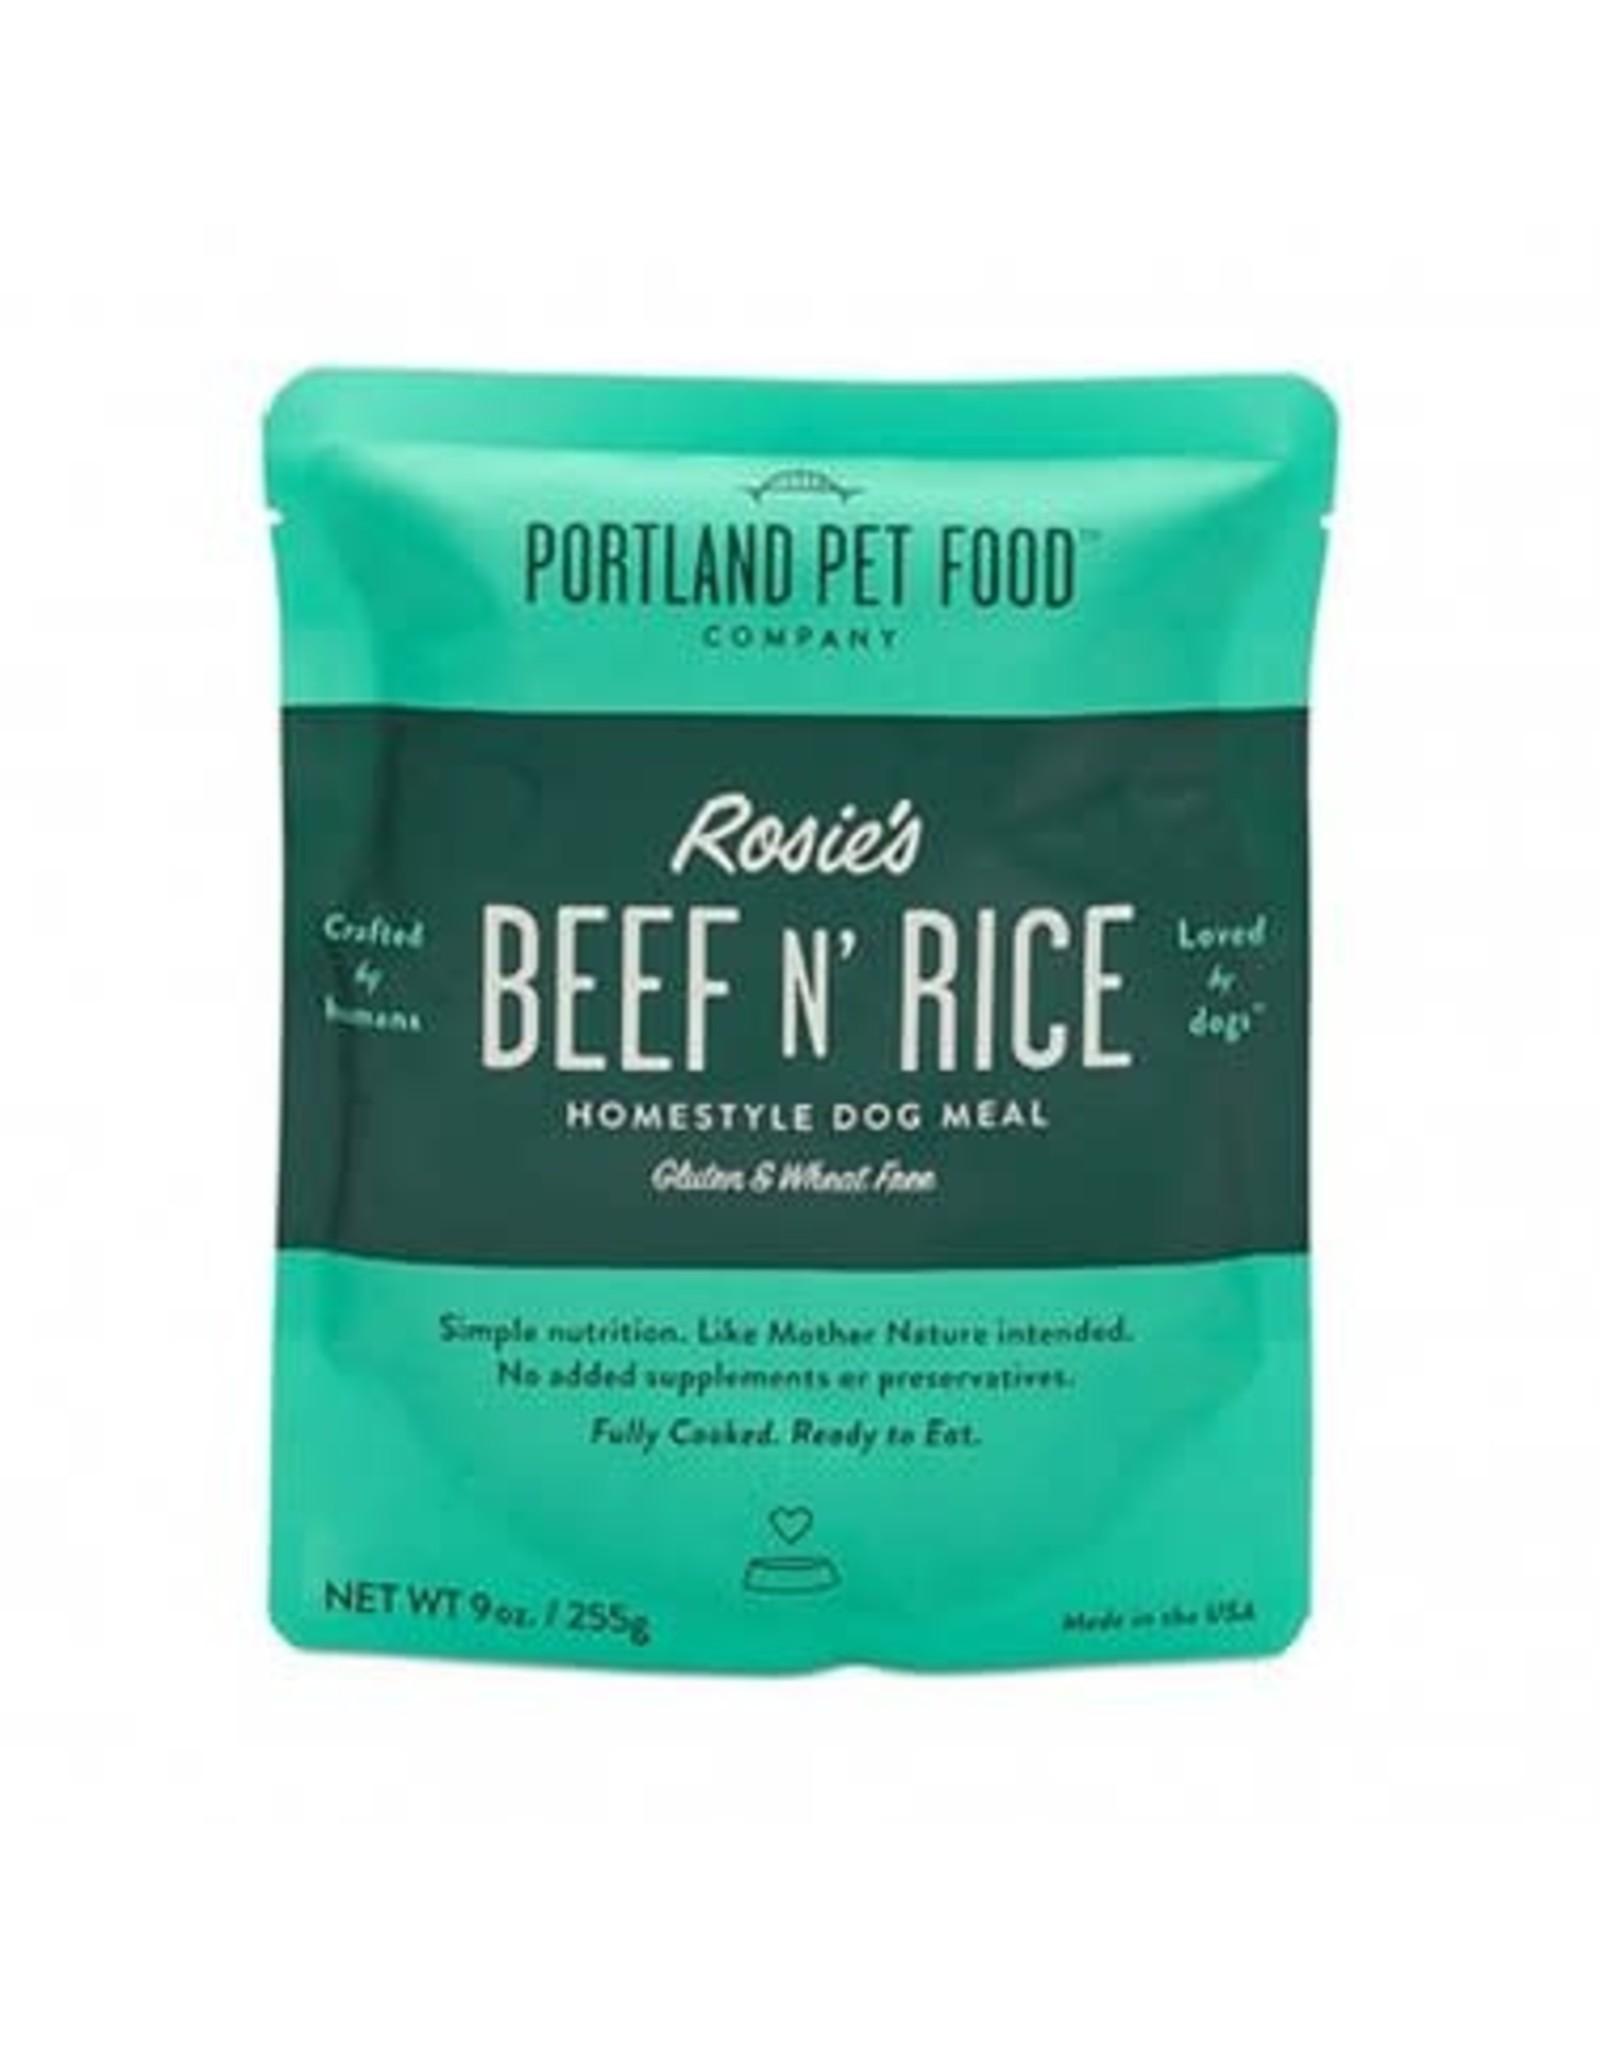 Portland Pet Food Portland Pet Foods Rosie's Beef & Rice Homestyle Dog Meal 9oz